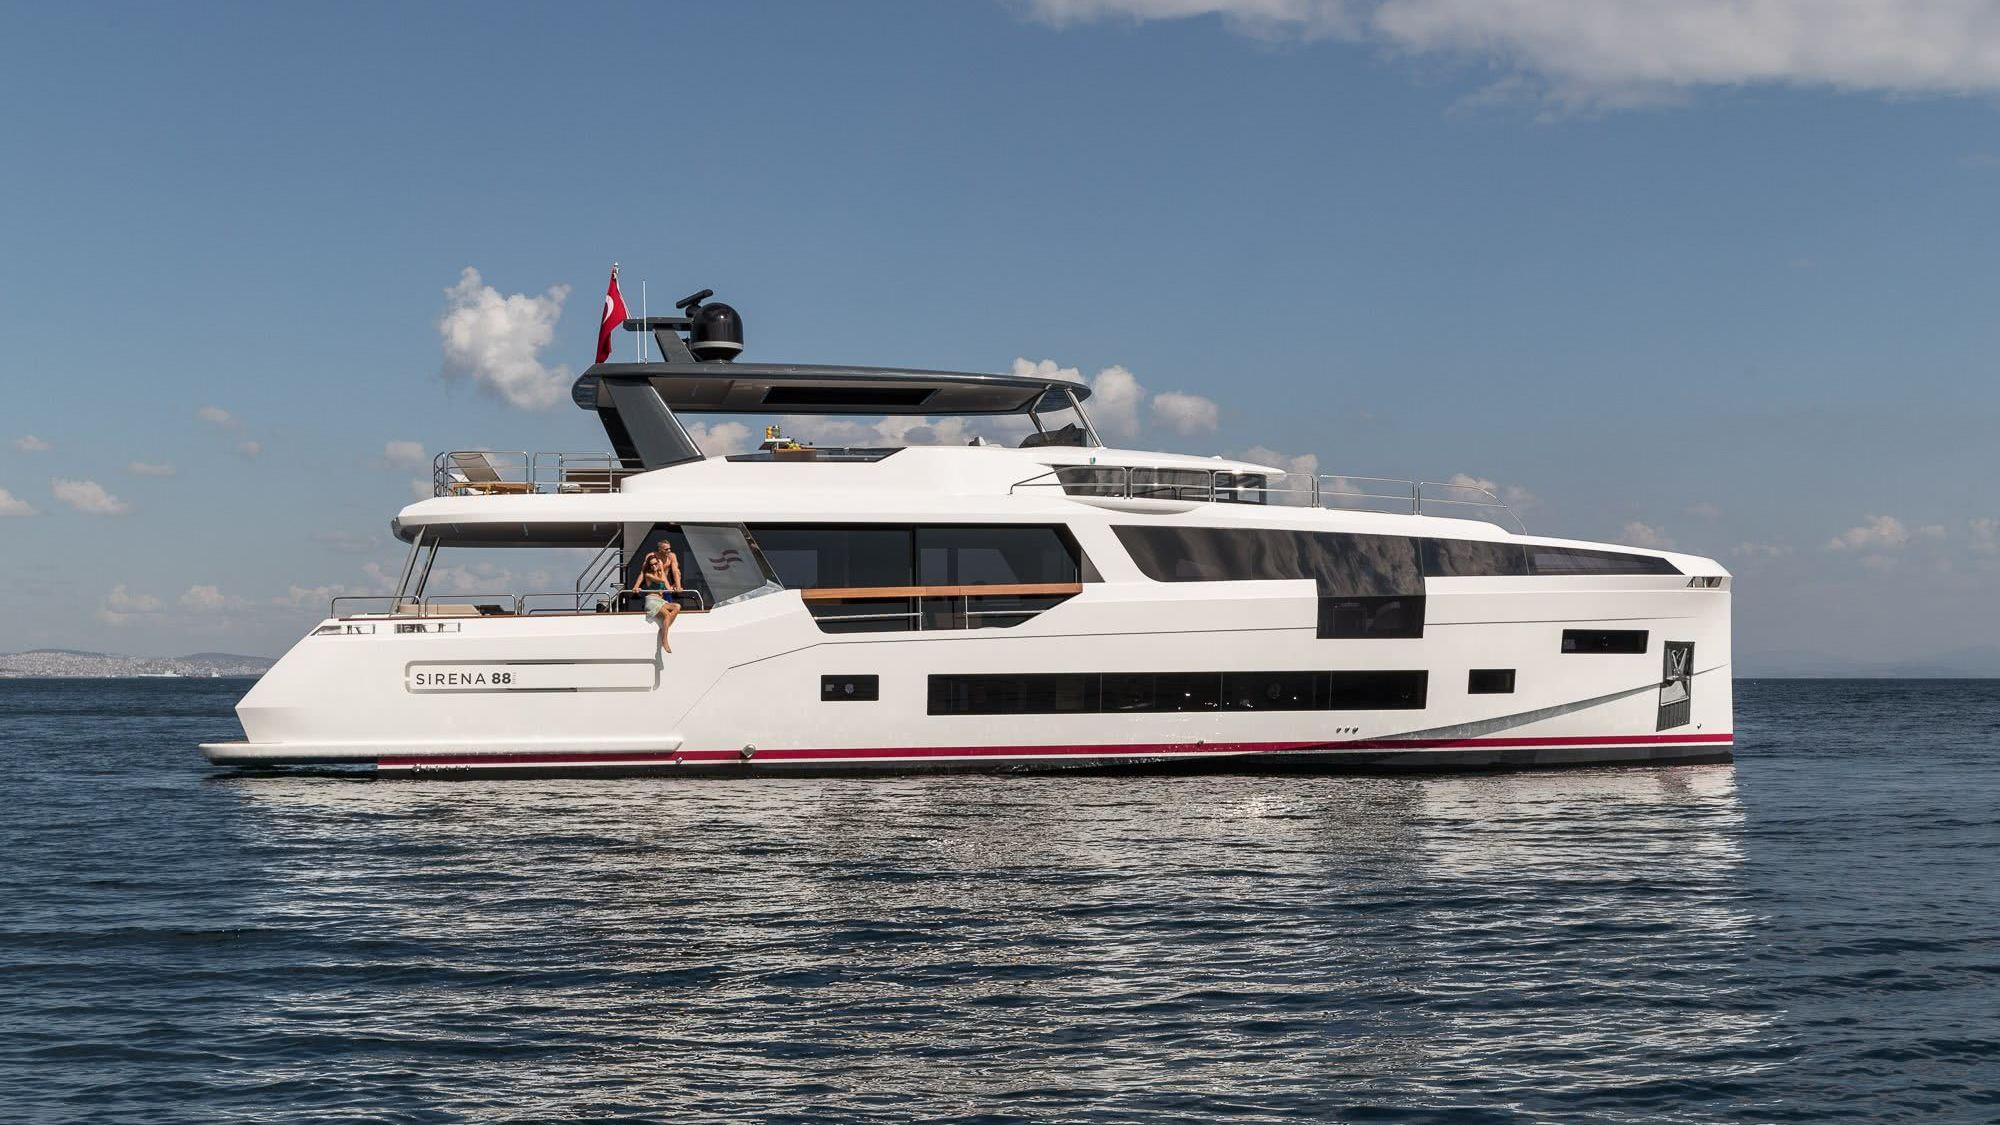 Sirena 88 Motor Yacht